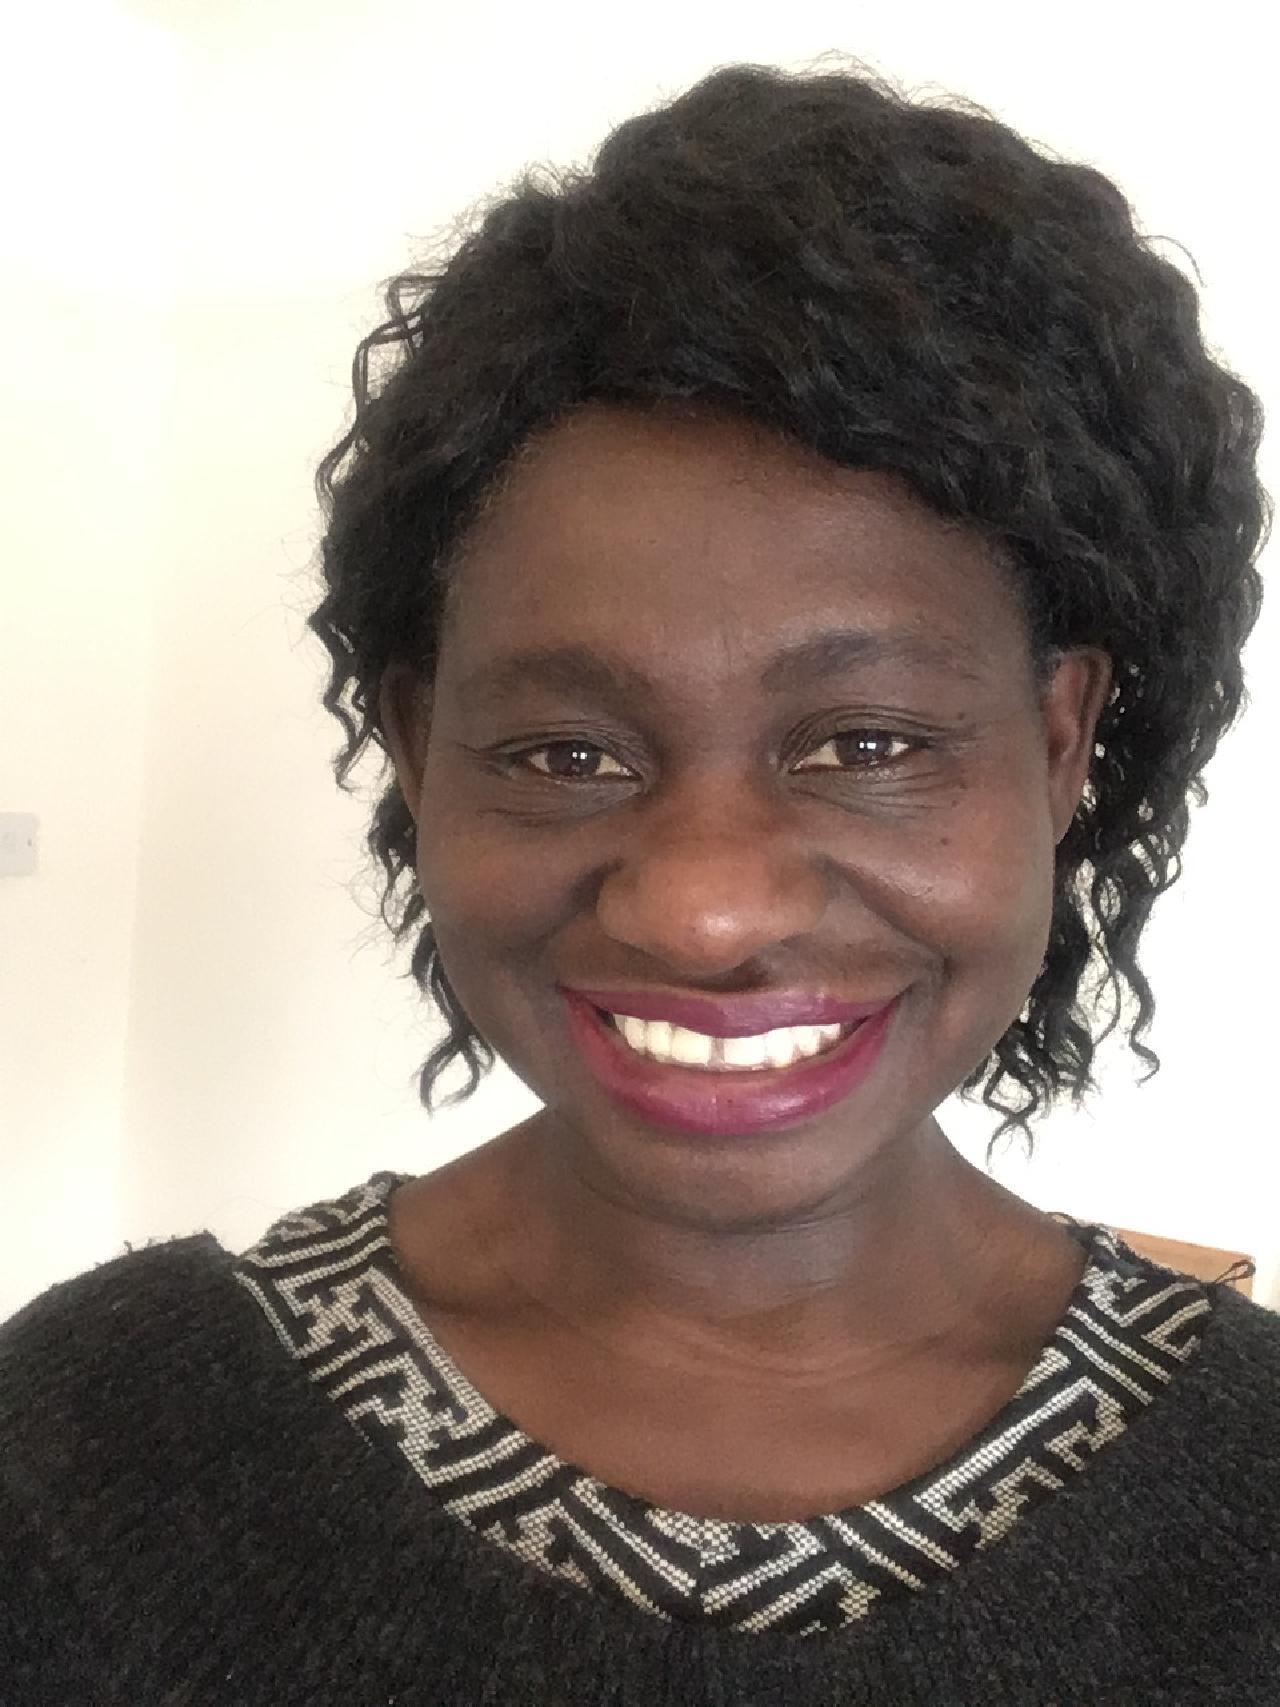 Profile picture of Funmi Adewole